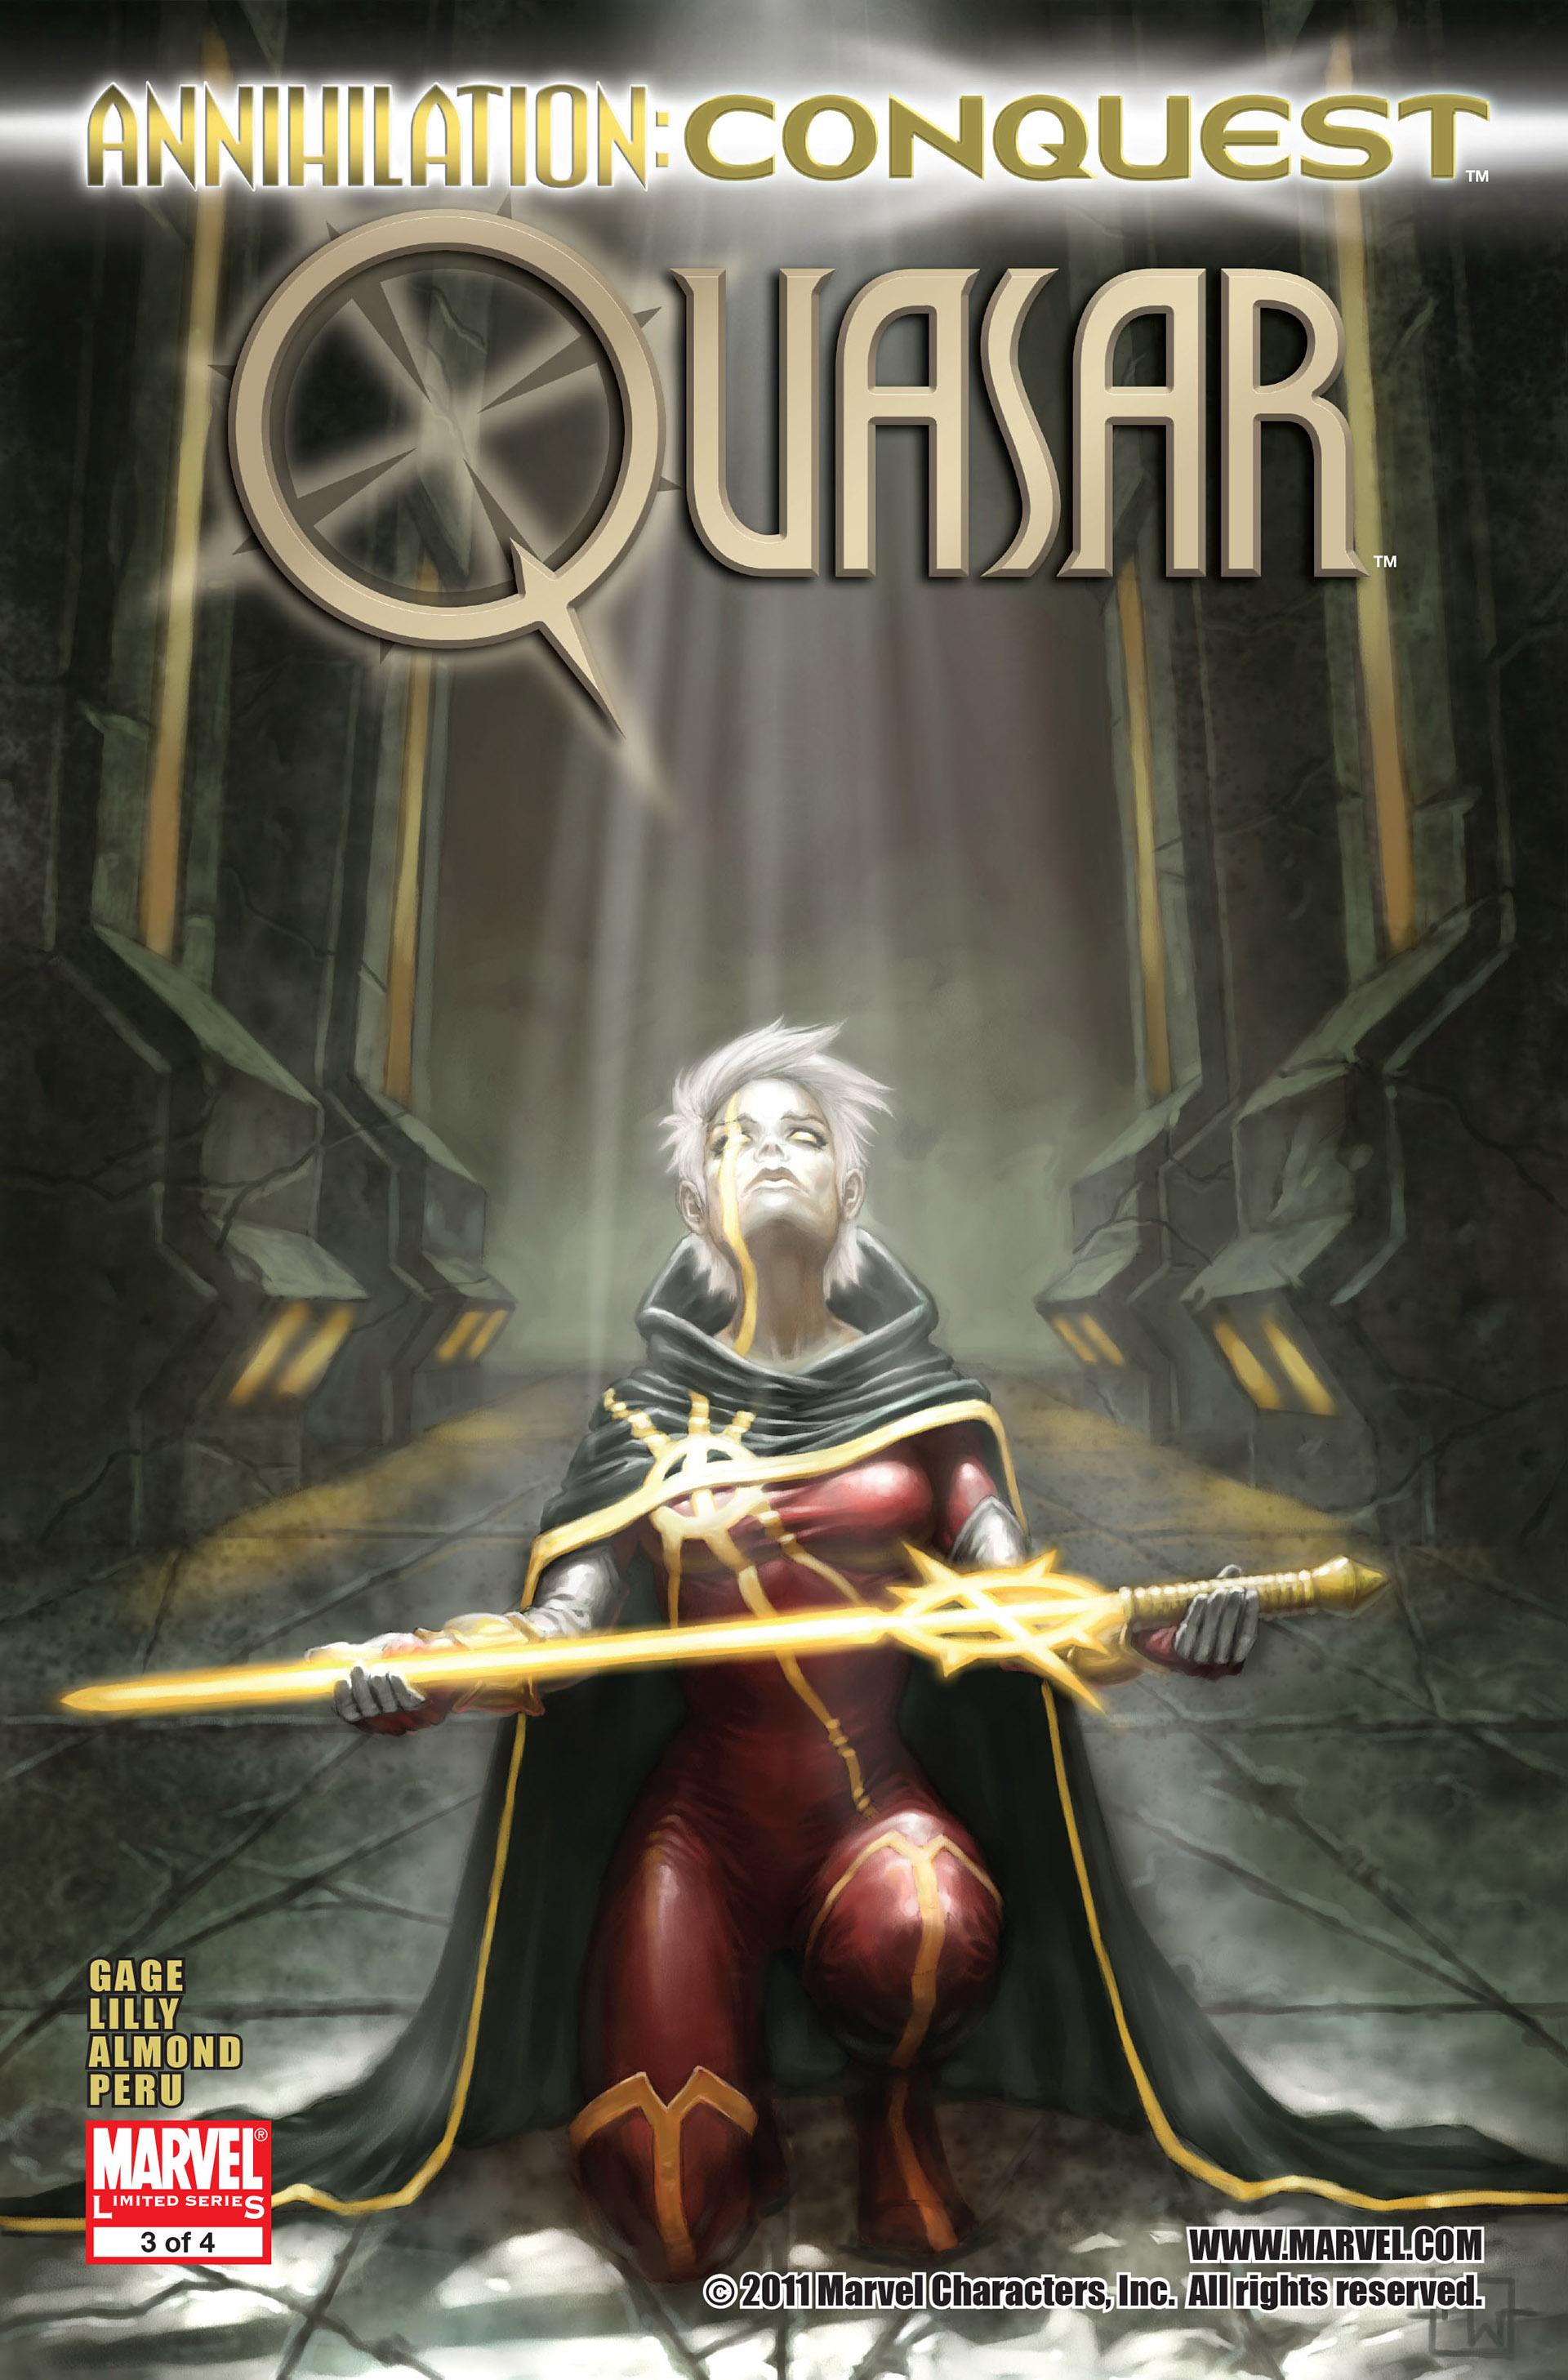 Annihilation: Conquest - Quasar 3 Page 1